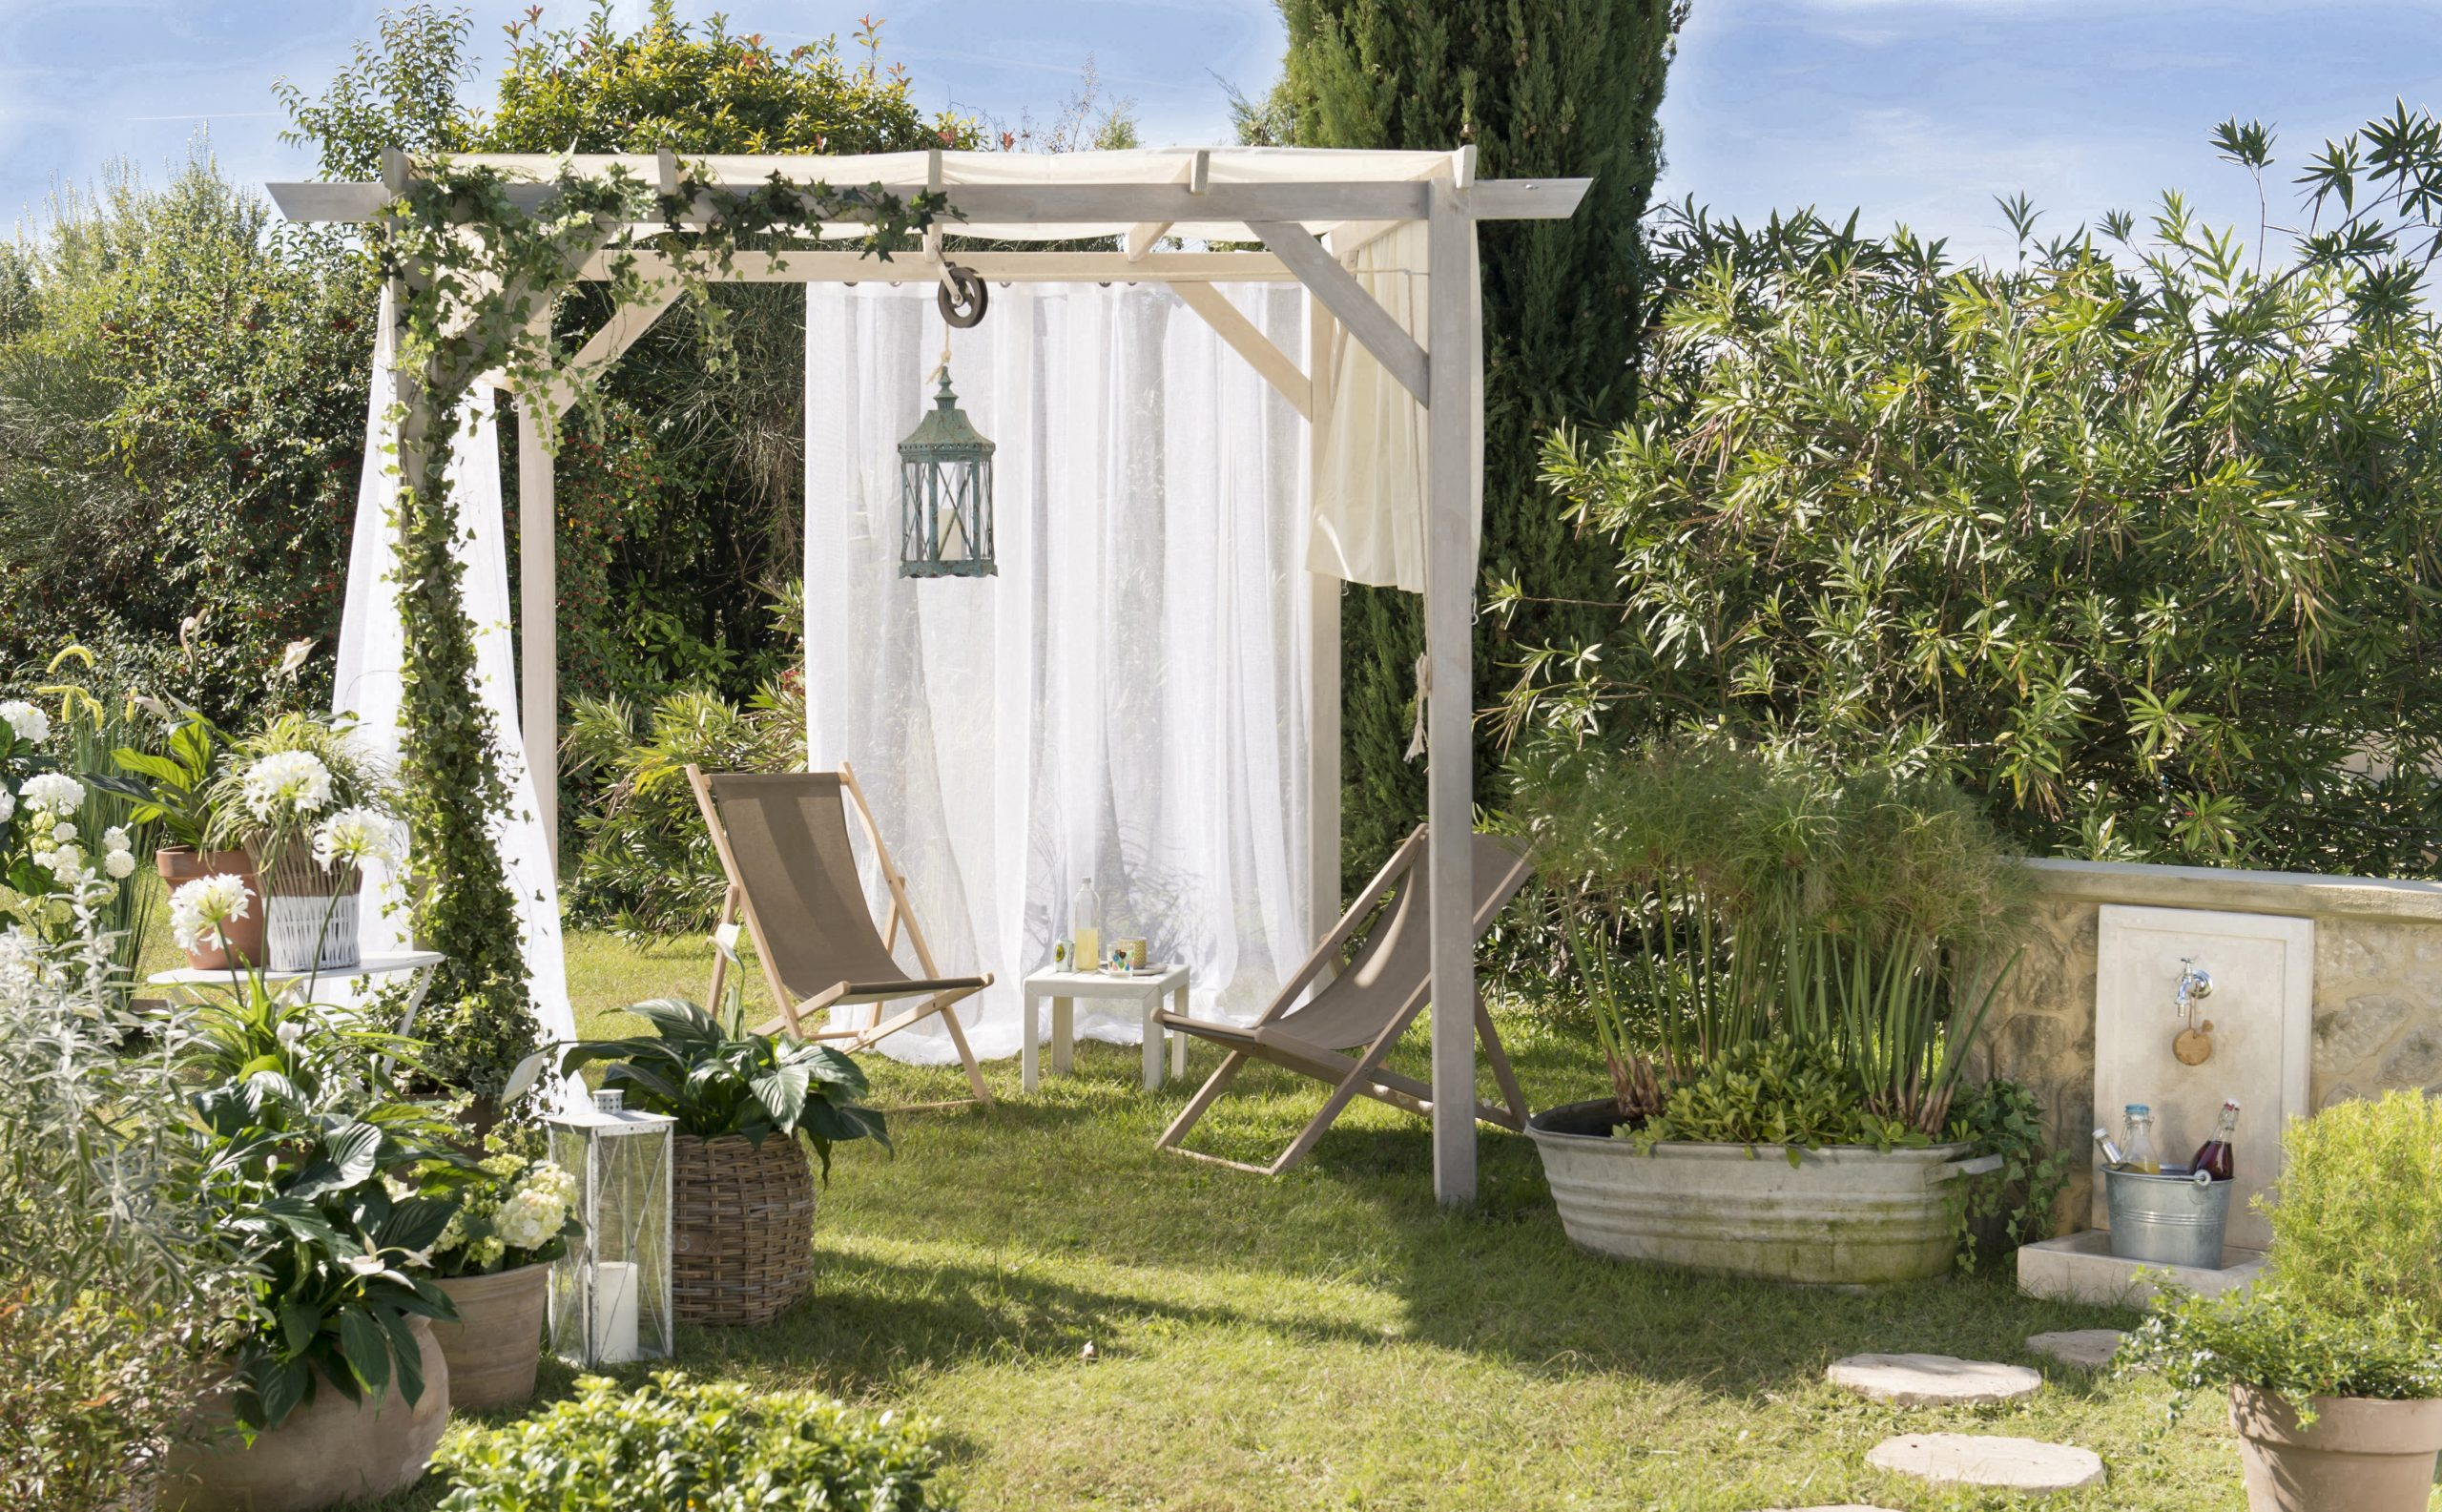 Pergola Autoportante Glycine, Bois Naturel, 9 M² dedans Tonnelle De Jardin Leroy Merlin